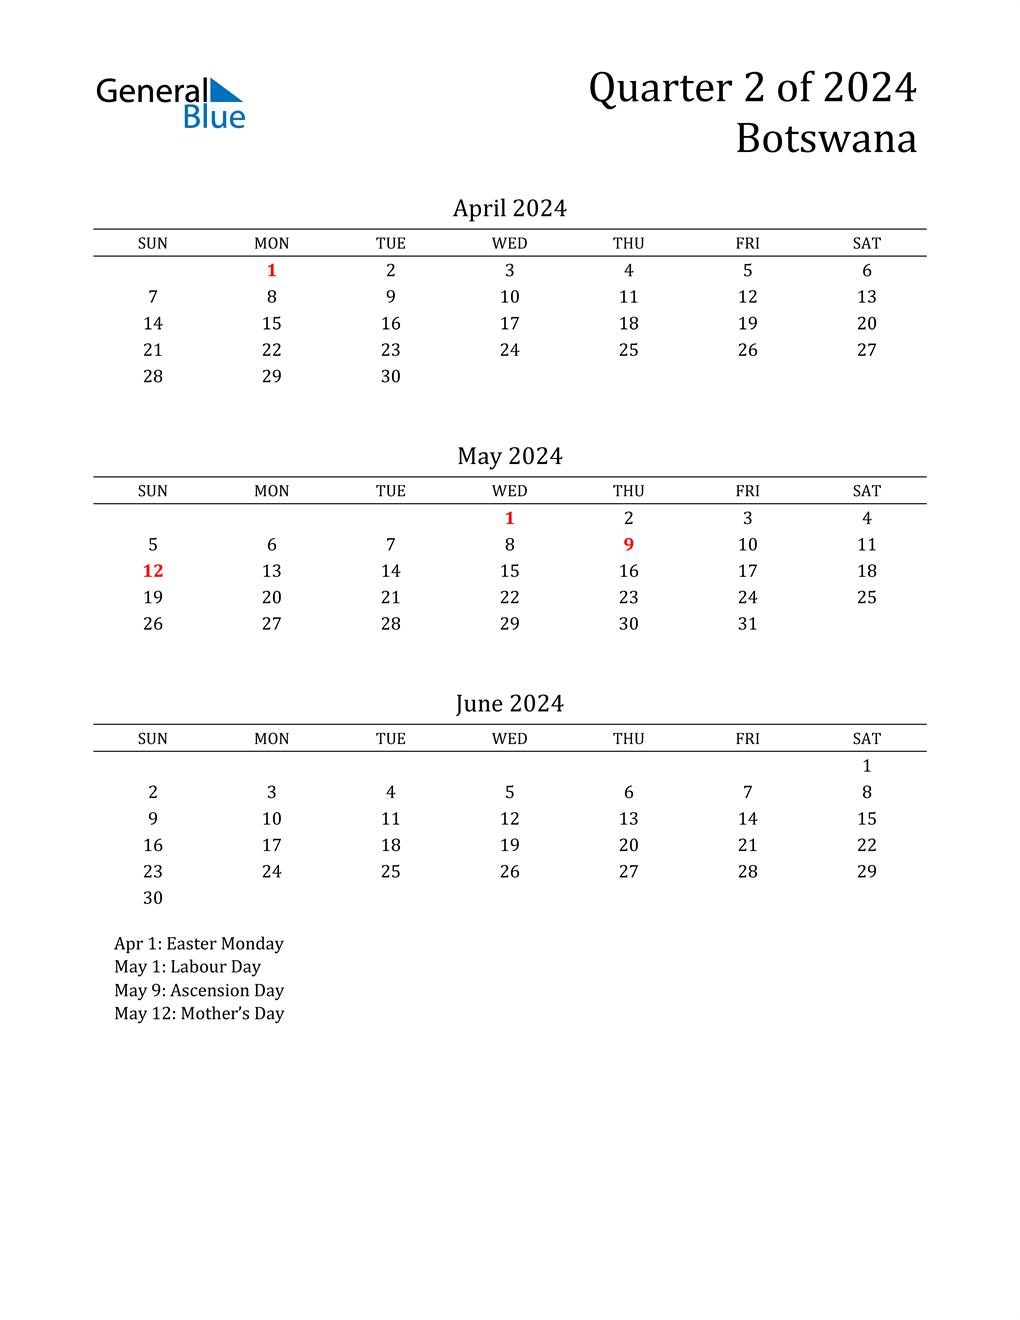 2024 Botswana Quarterly Calendar